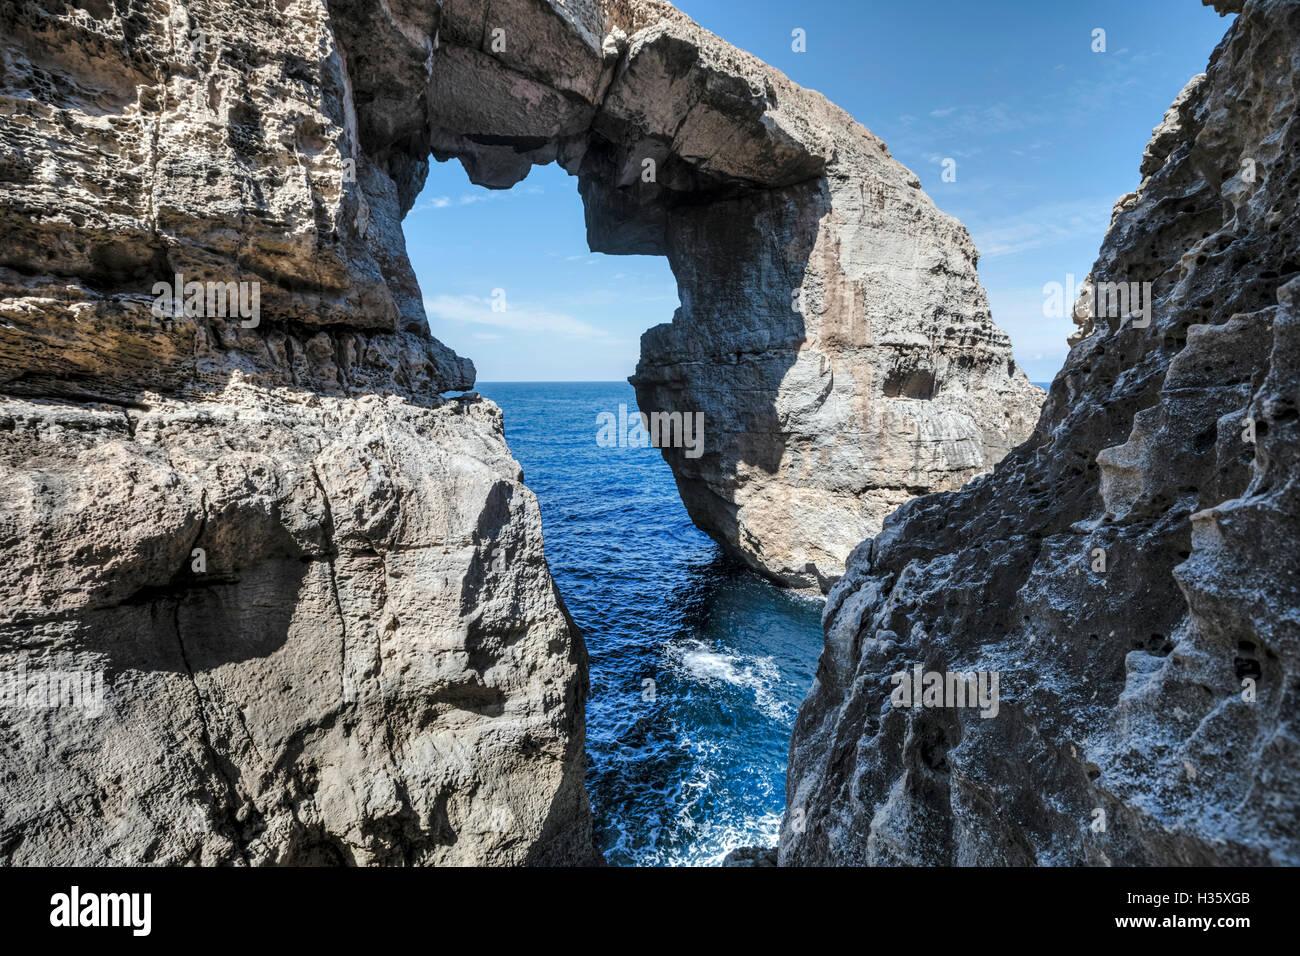 Wied Il Mielah, Gharb, Gozo, Malta Imagen De Stock